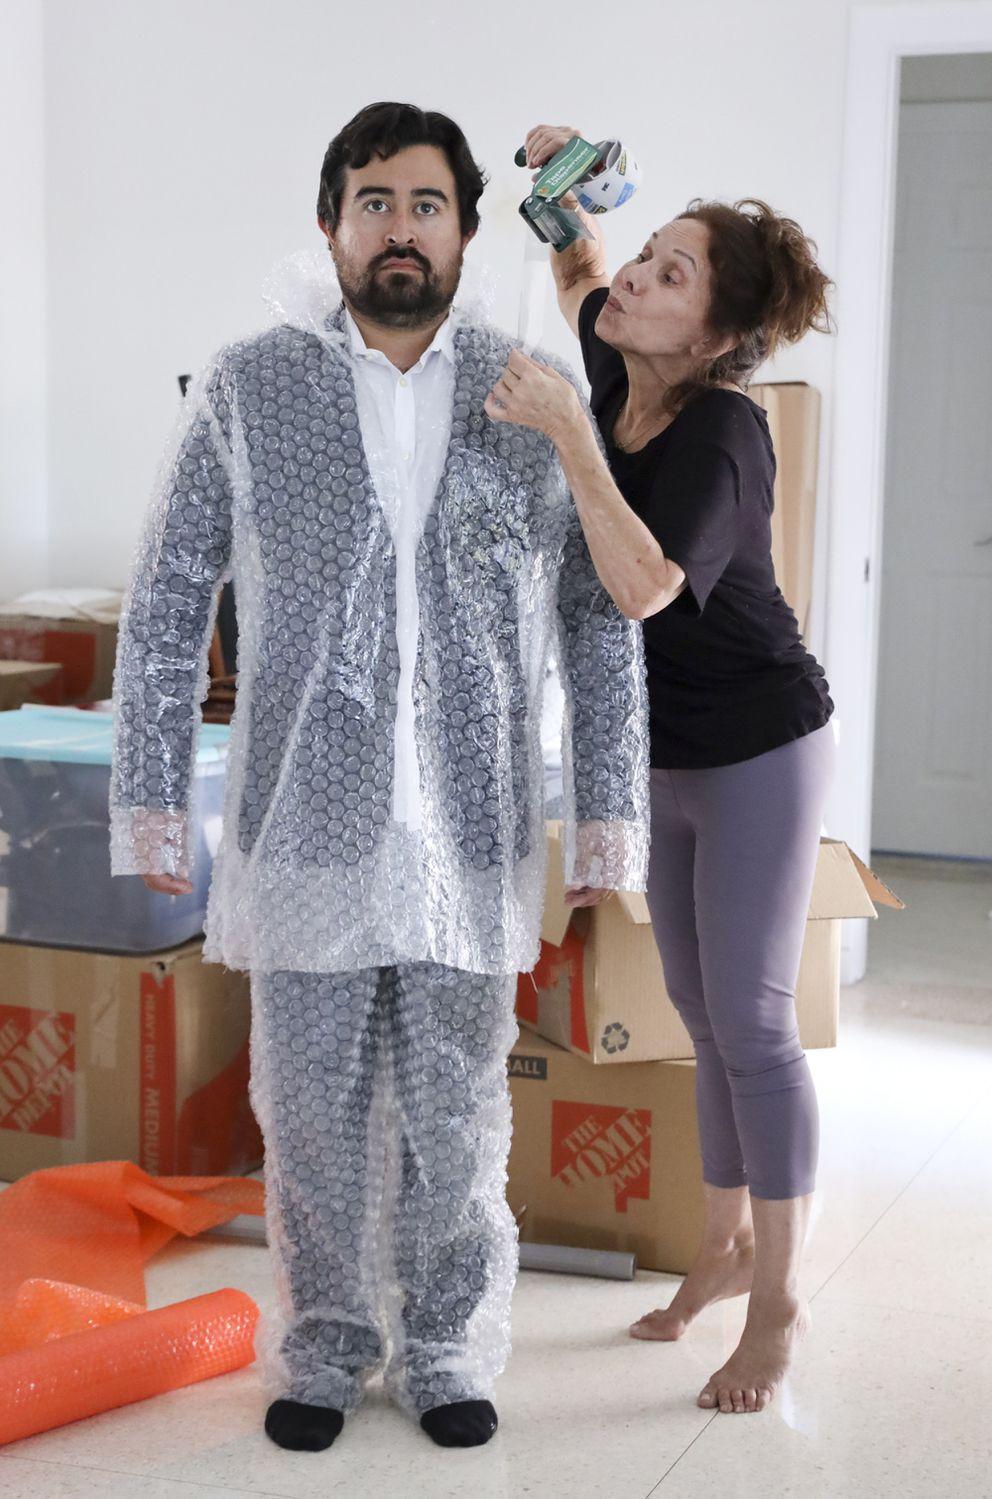 Bubble Wrap Suit (Carle Juste/Miami Herald/TNS)